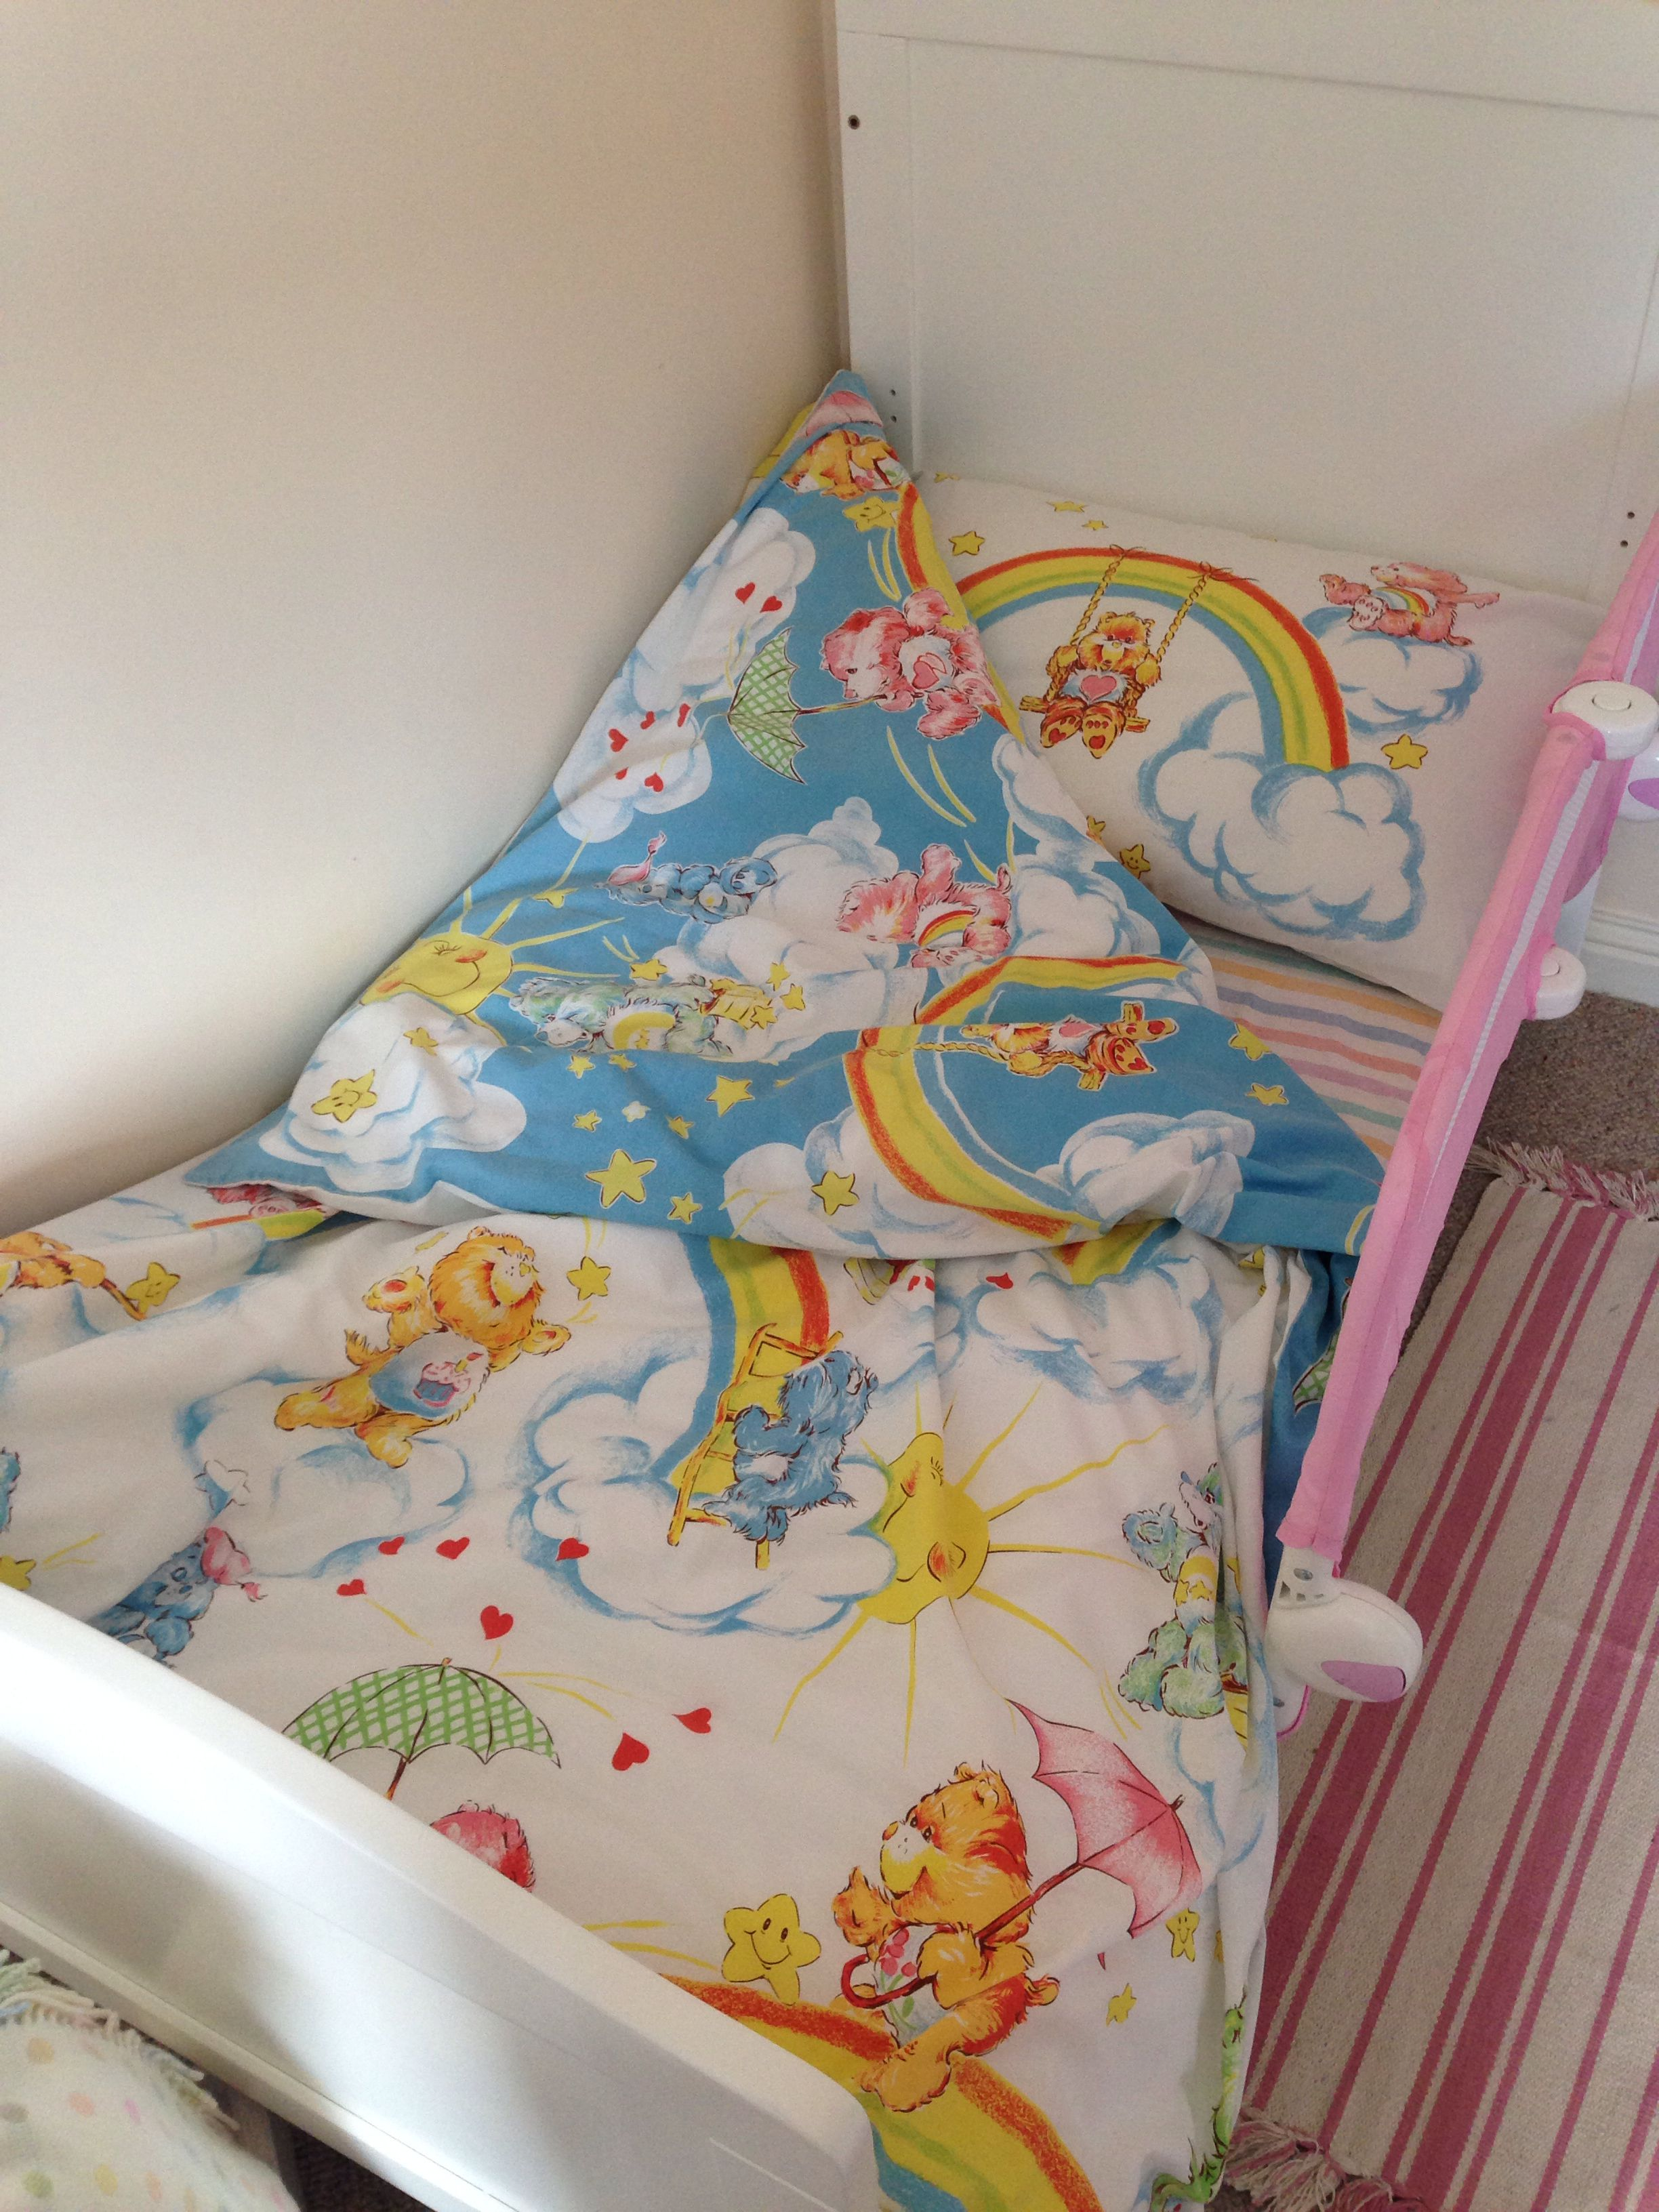 Vintage Care Bear Bedding In Little Girls Room